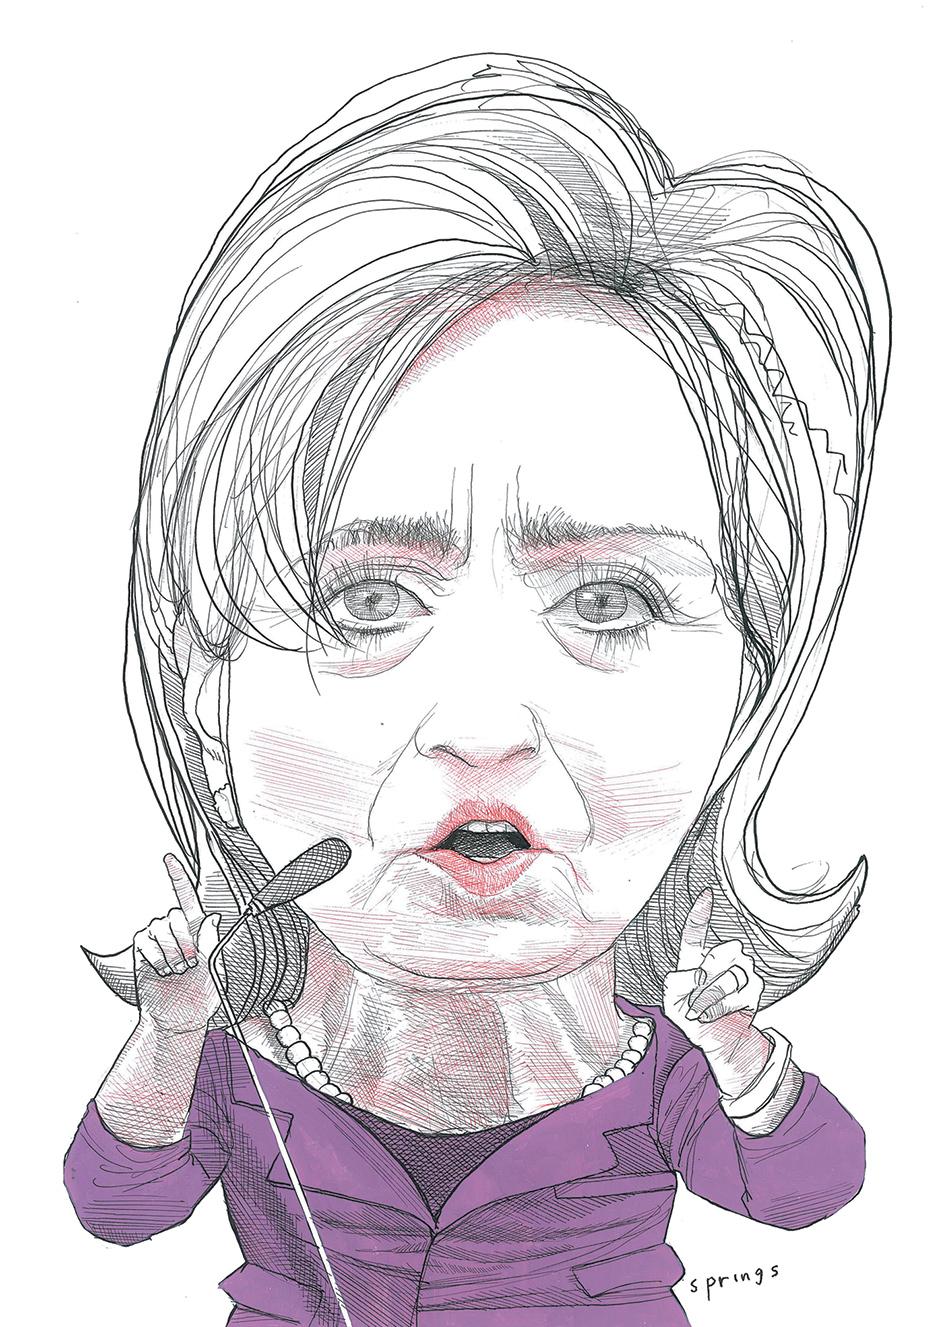 Hillary By Joseph Lelyveld The New York Review Of Books